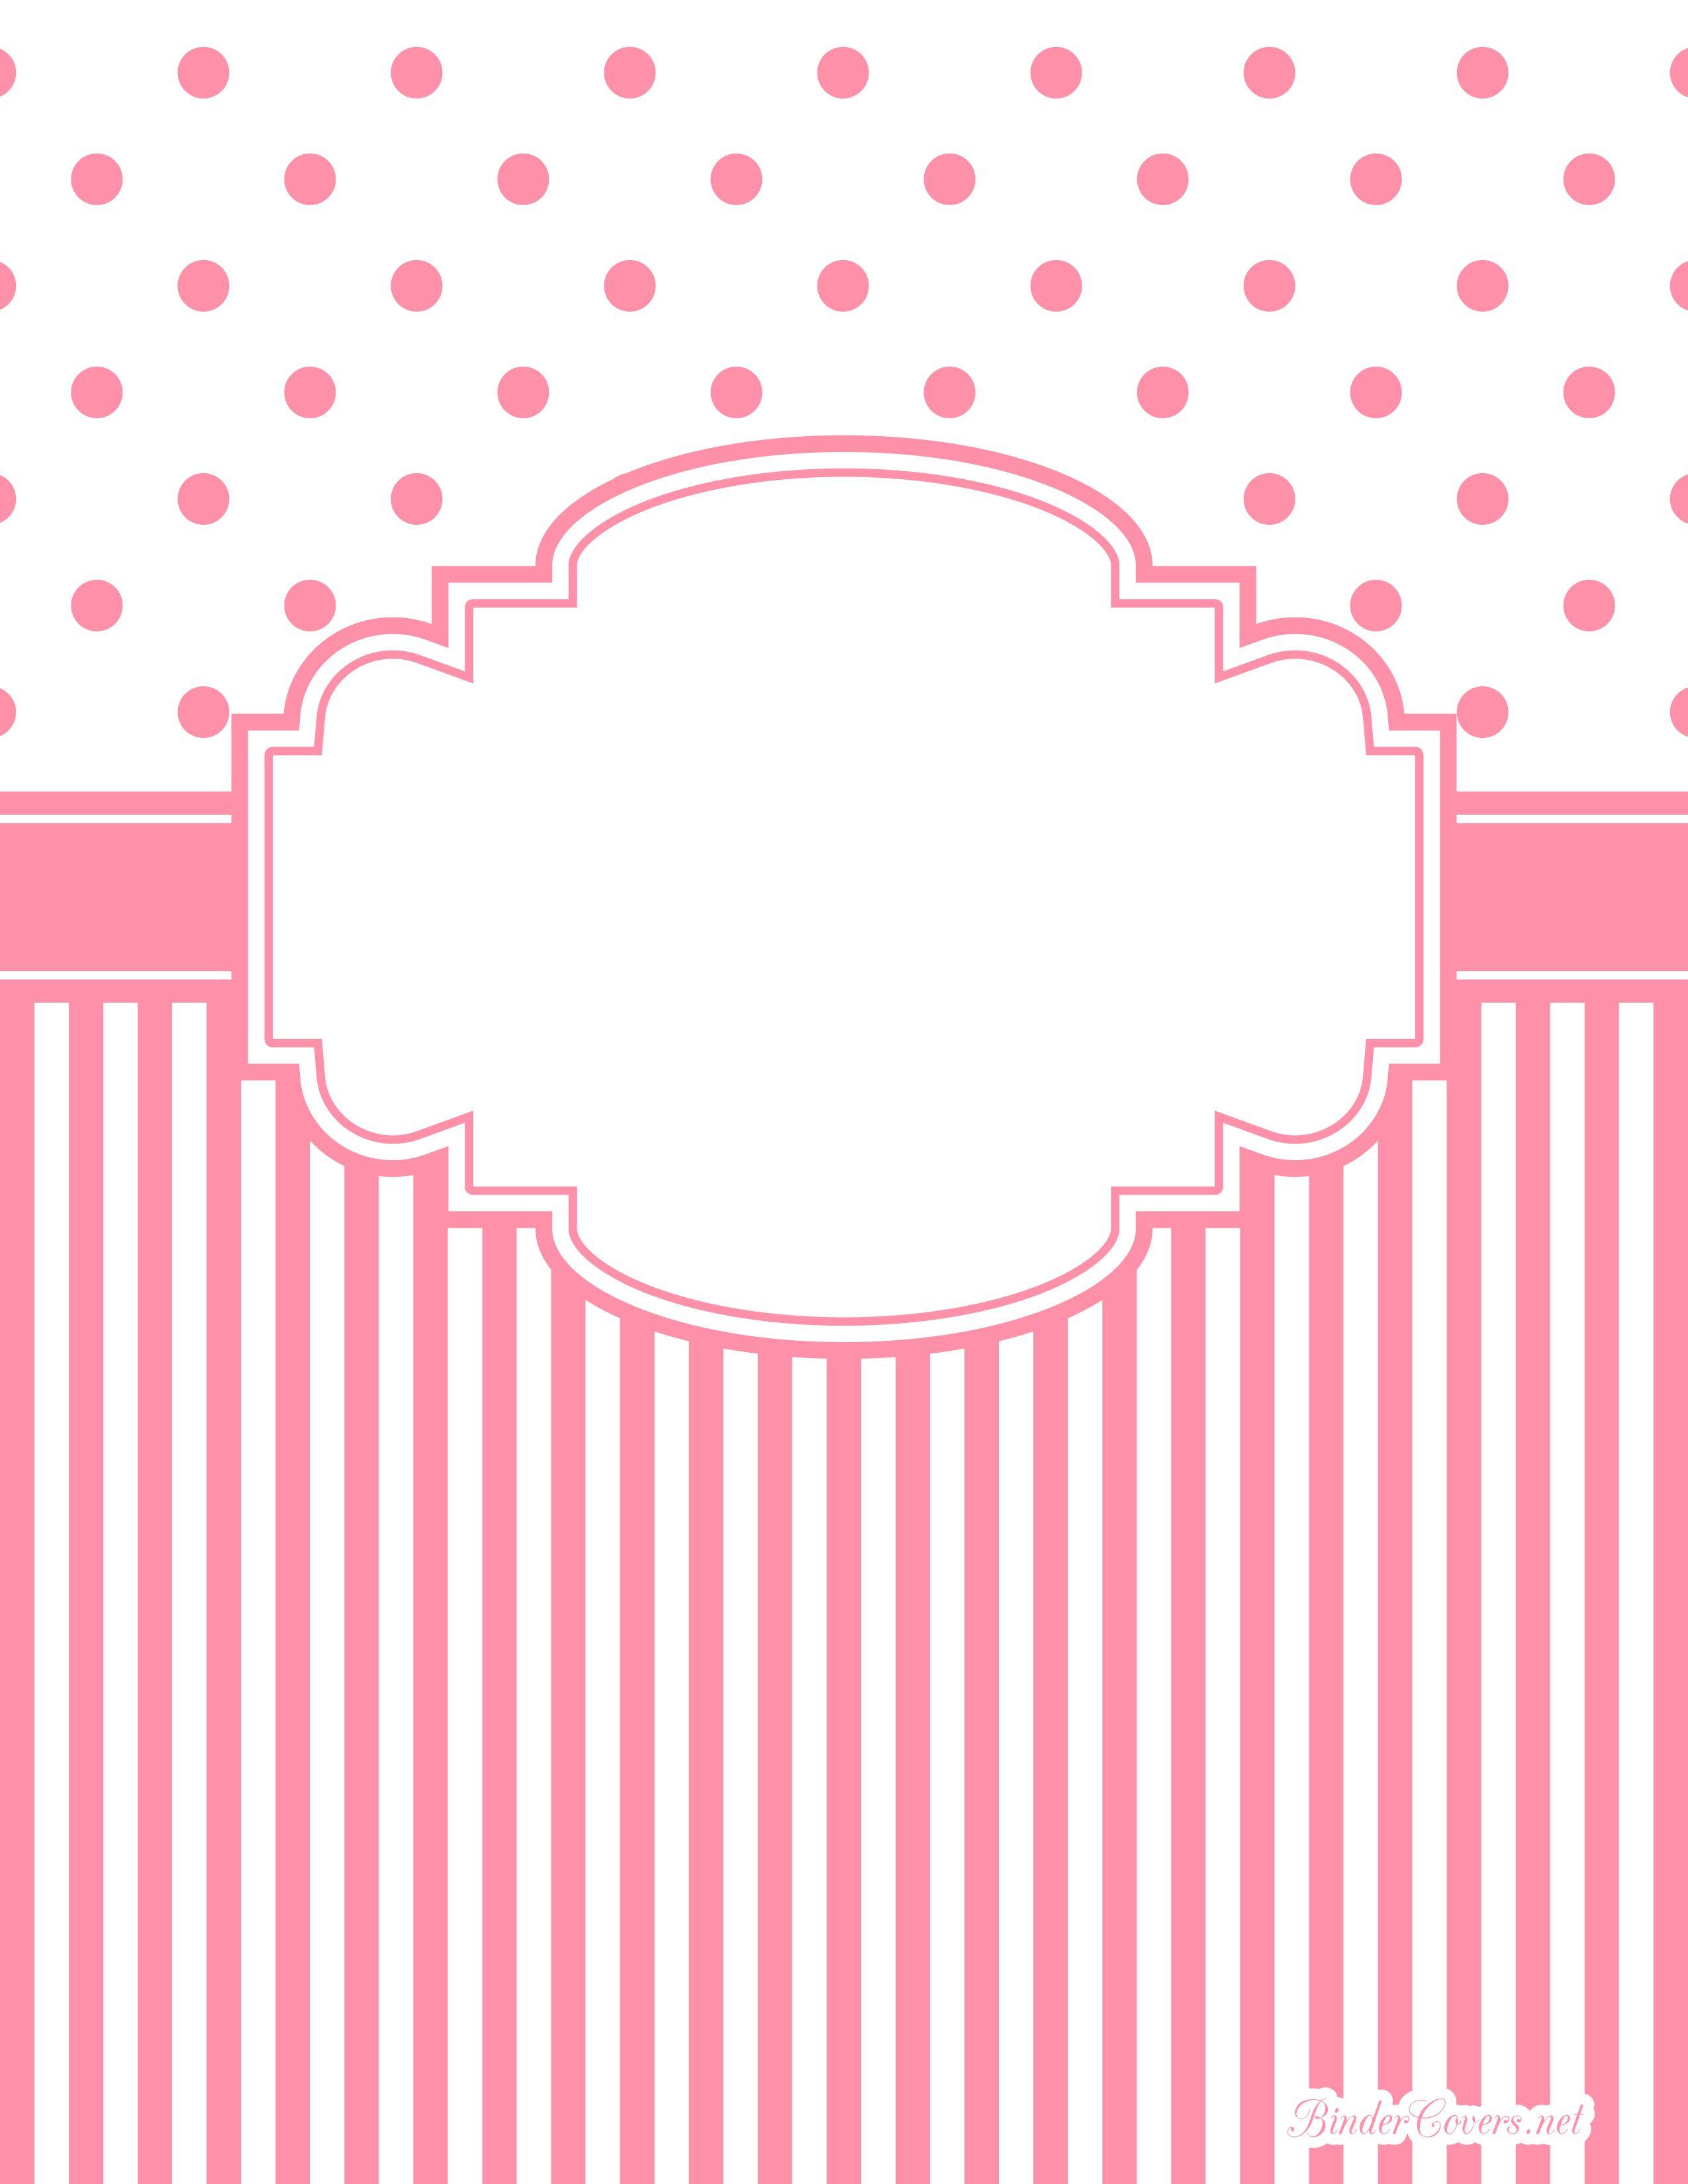 Pink Polka Dot And Stripe Binder Cover Watermarked Jpg 2 550 3 300